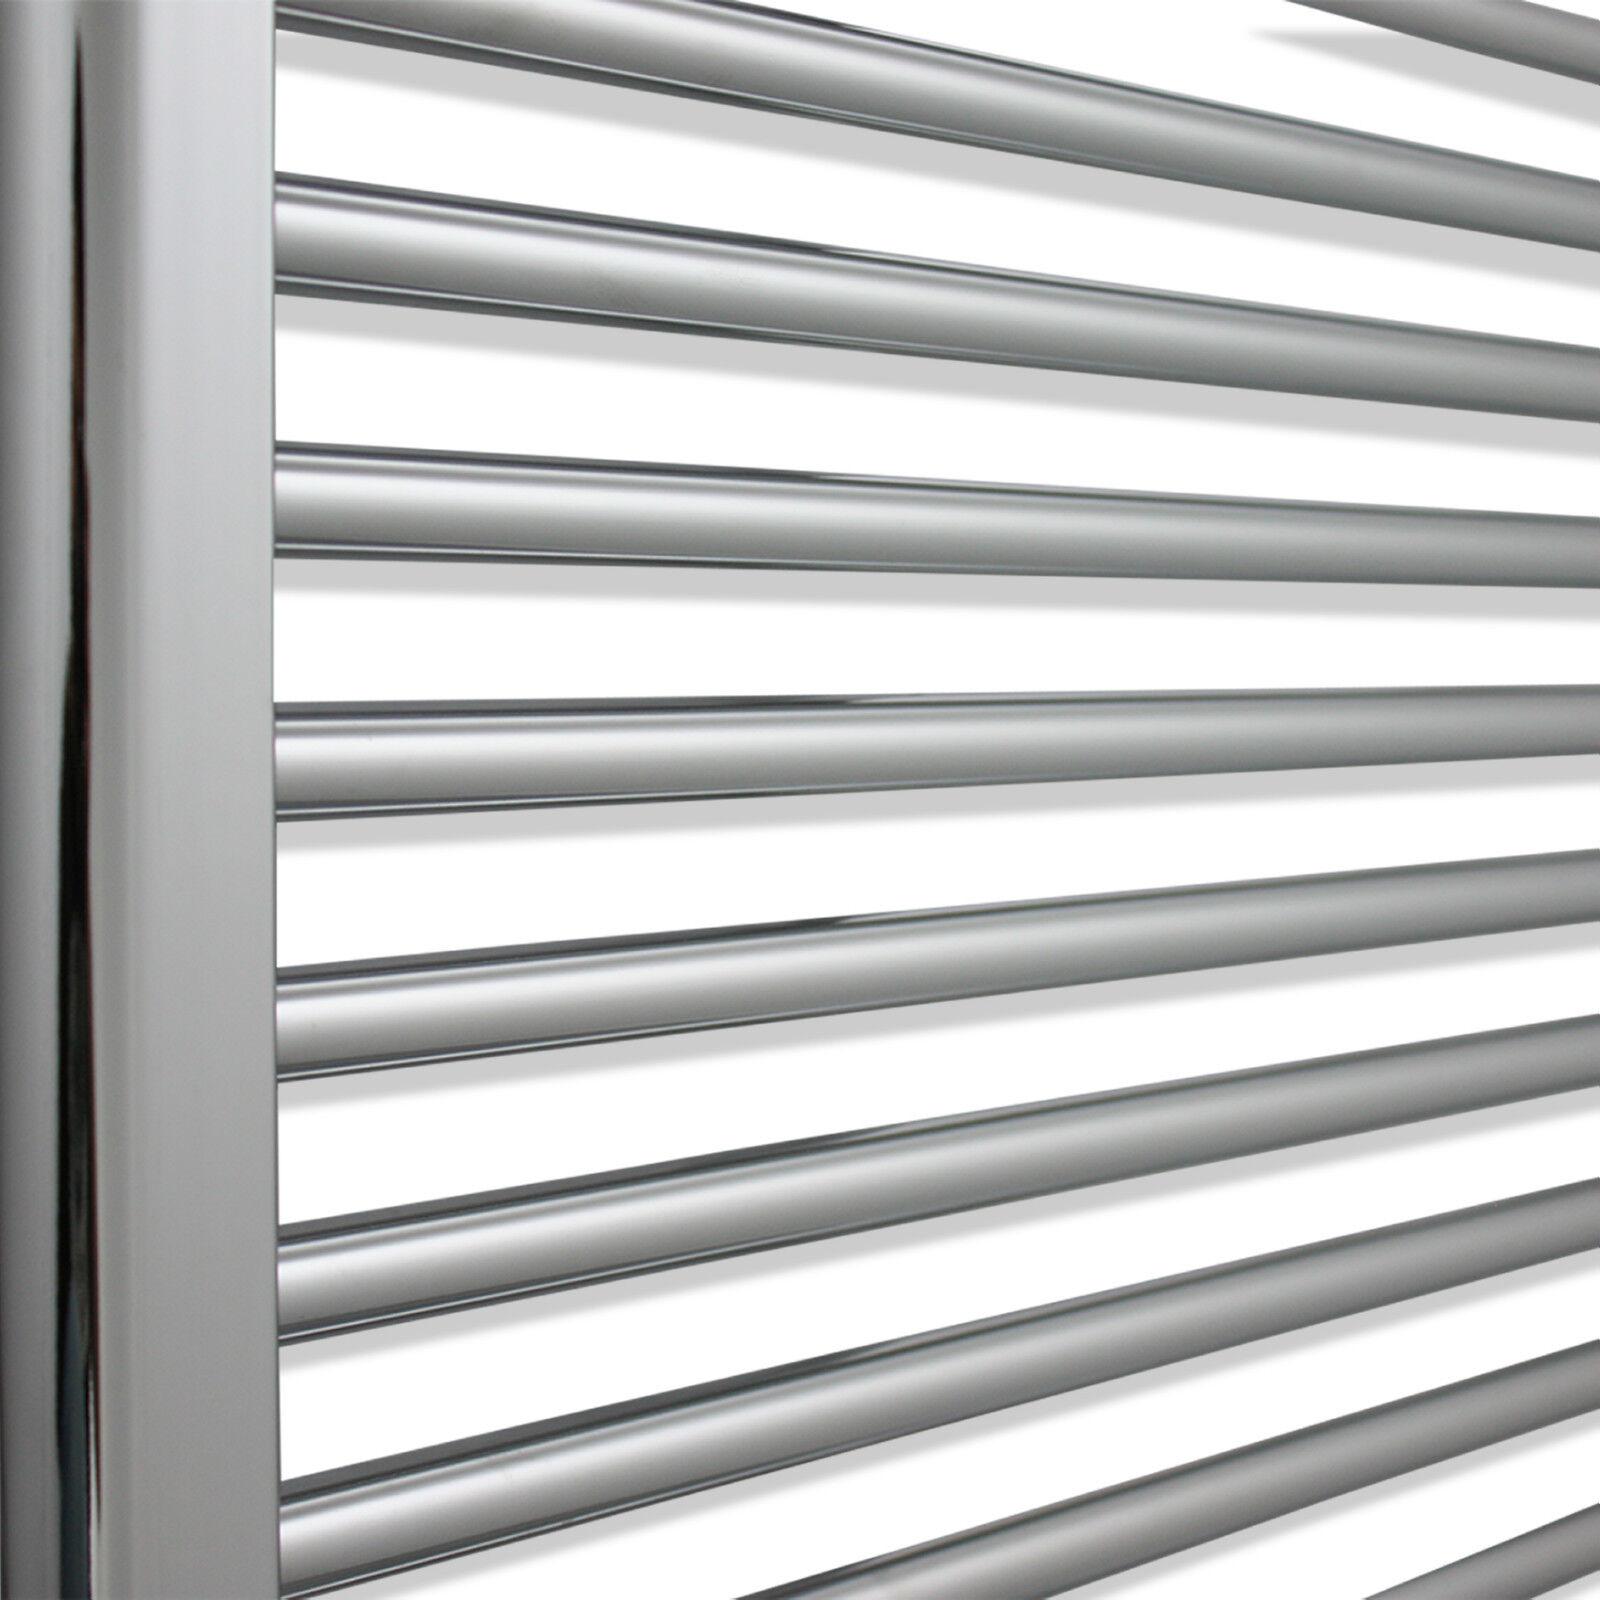 Do Heated Towel Rails Heat The Bathroom - 20 cm width 80 cm height flat chrome heated towel rail radiator bathroom warmer with electric or central heating options